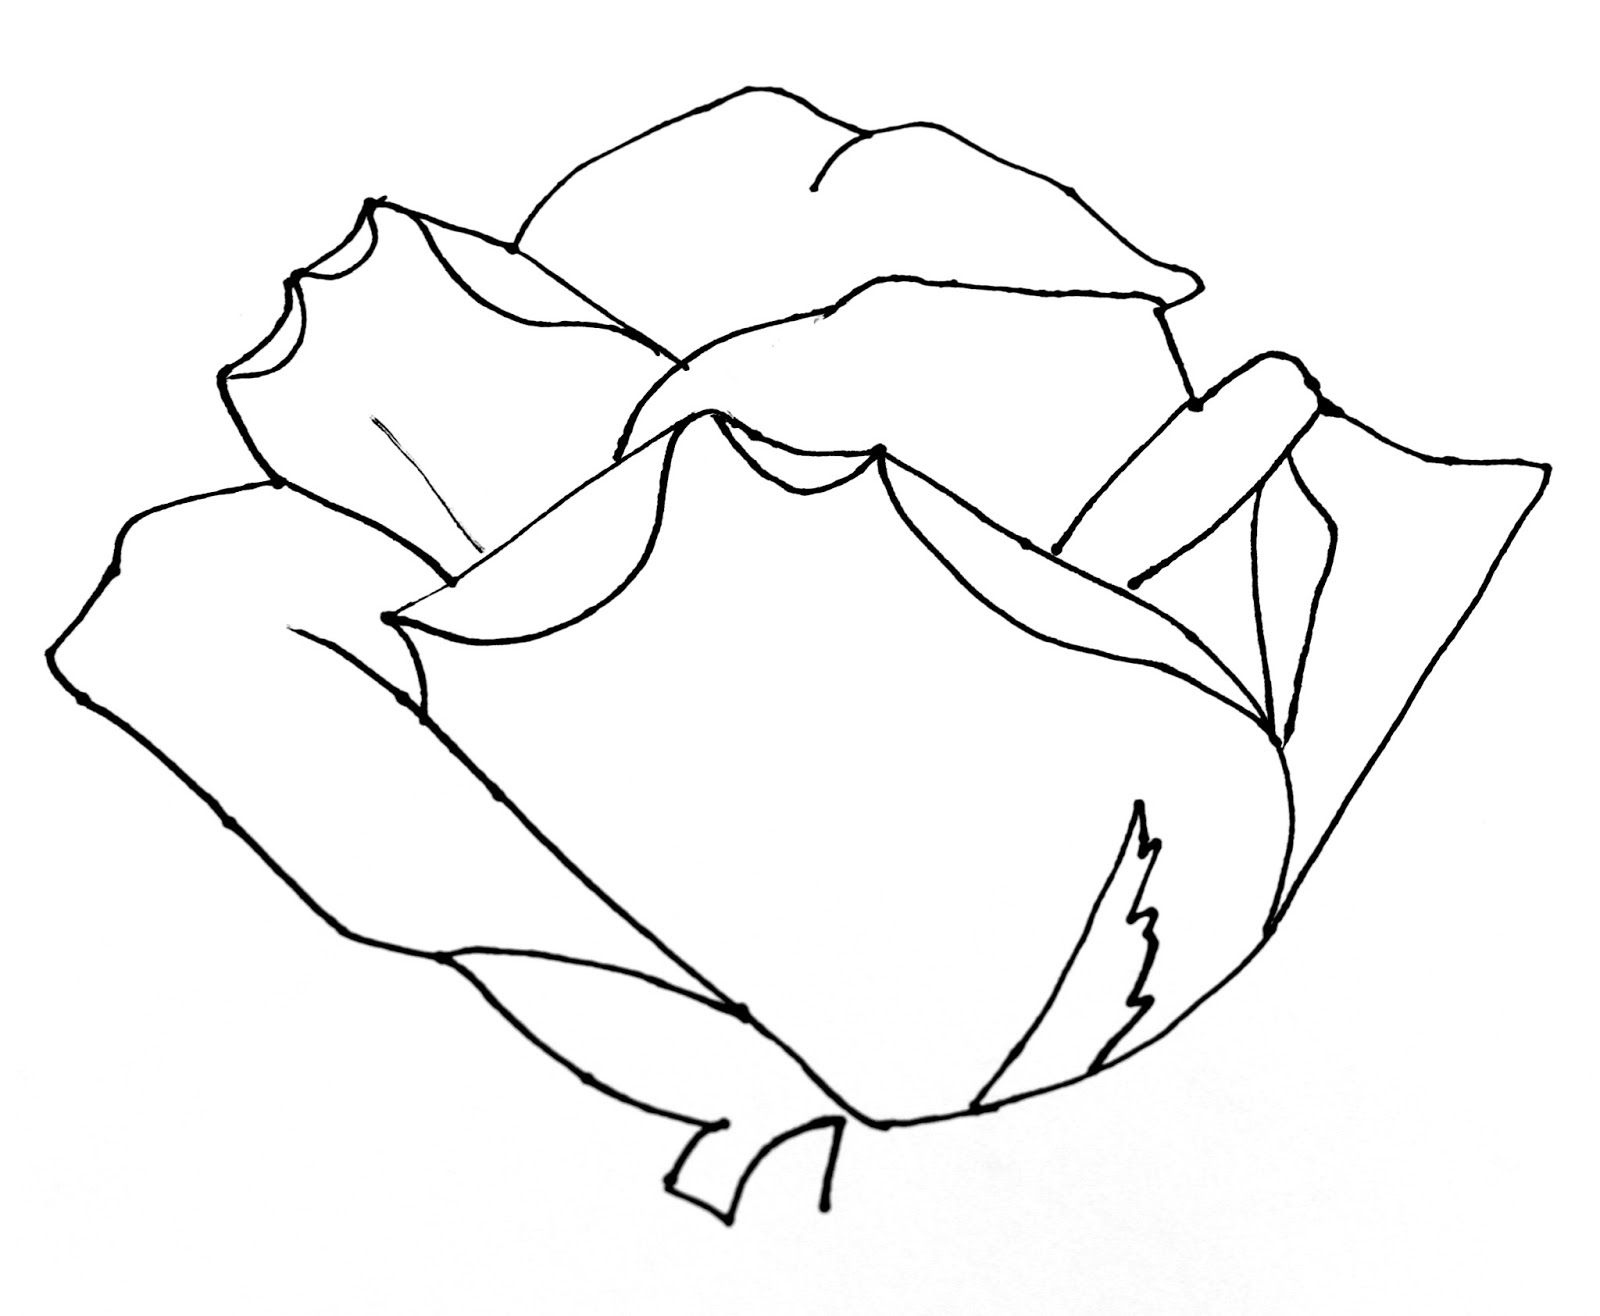 Flower Petals Line Drawing : Smart class still life roses